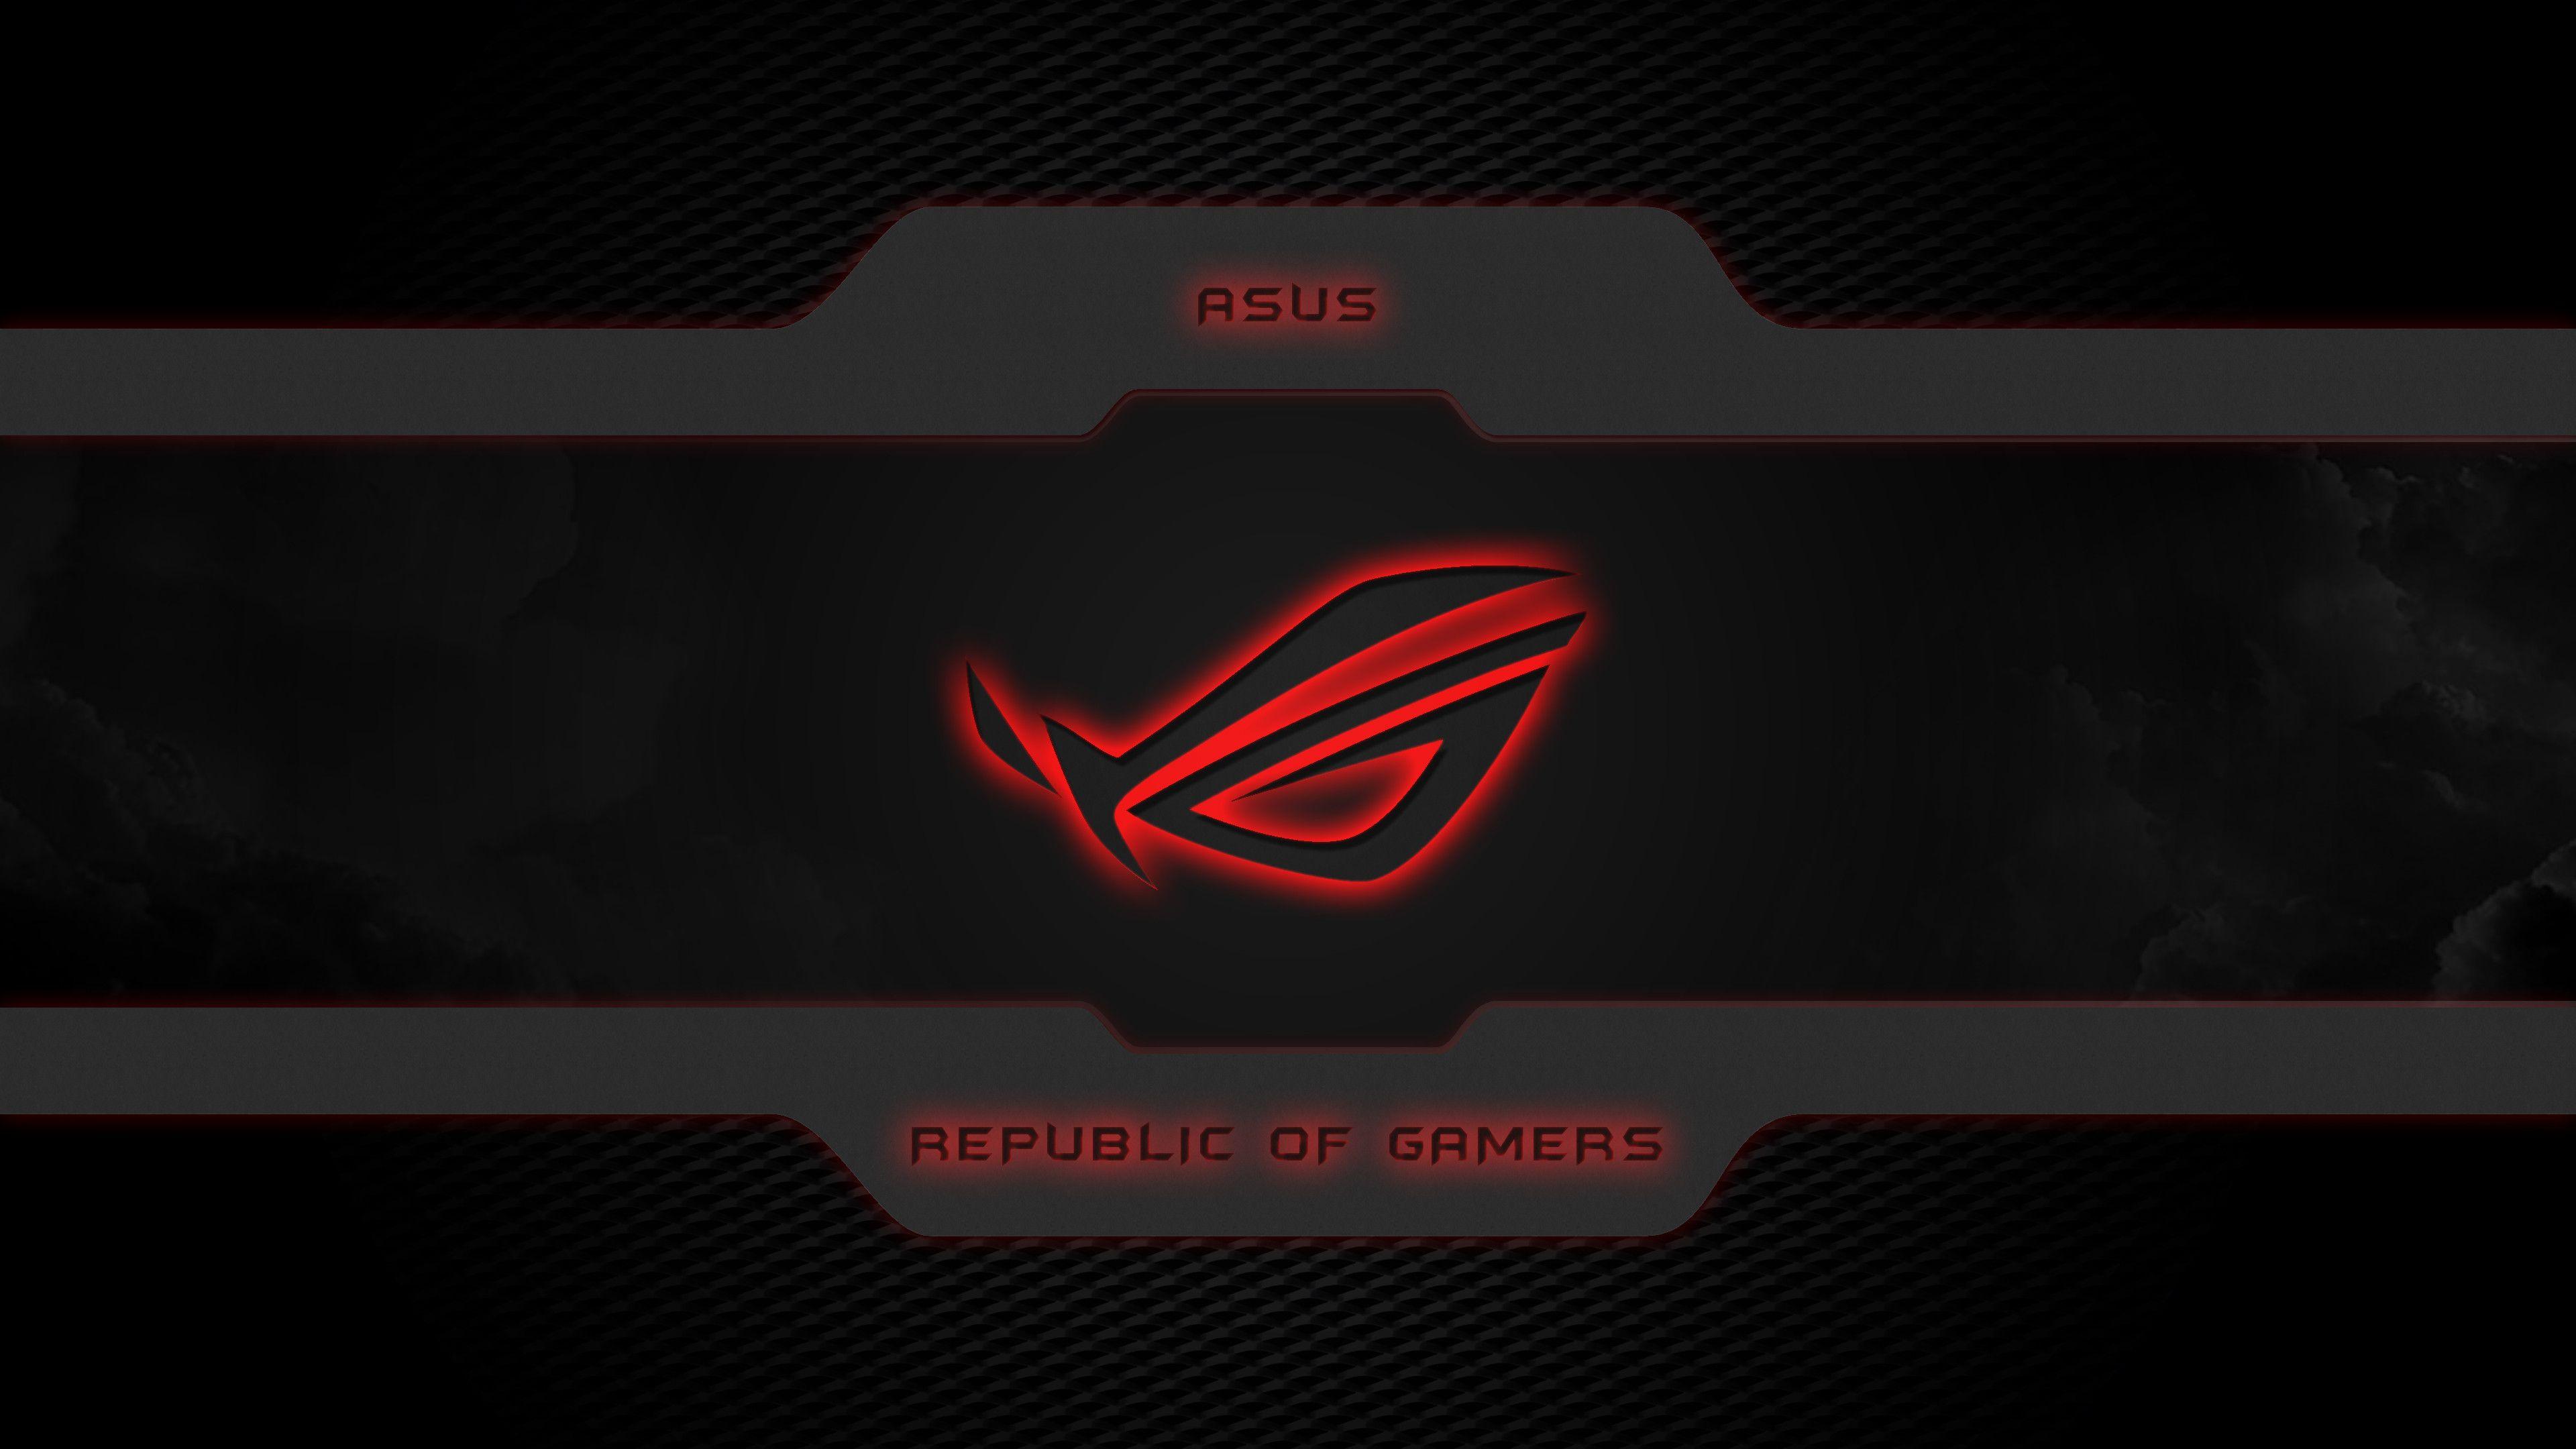 Asus ROG 4K Gaming Wallpapers Top Free Asus ROG 4K Gaming